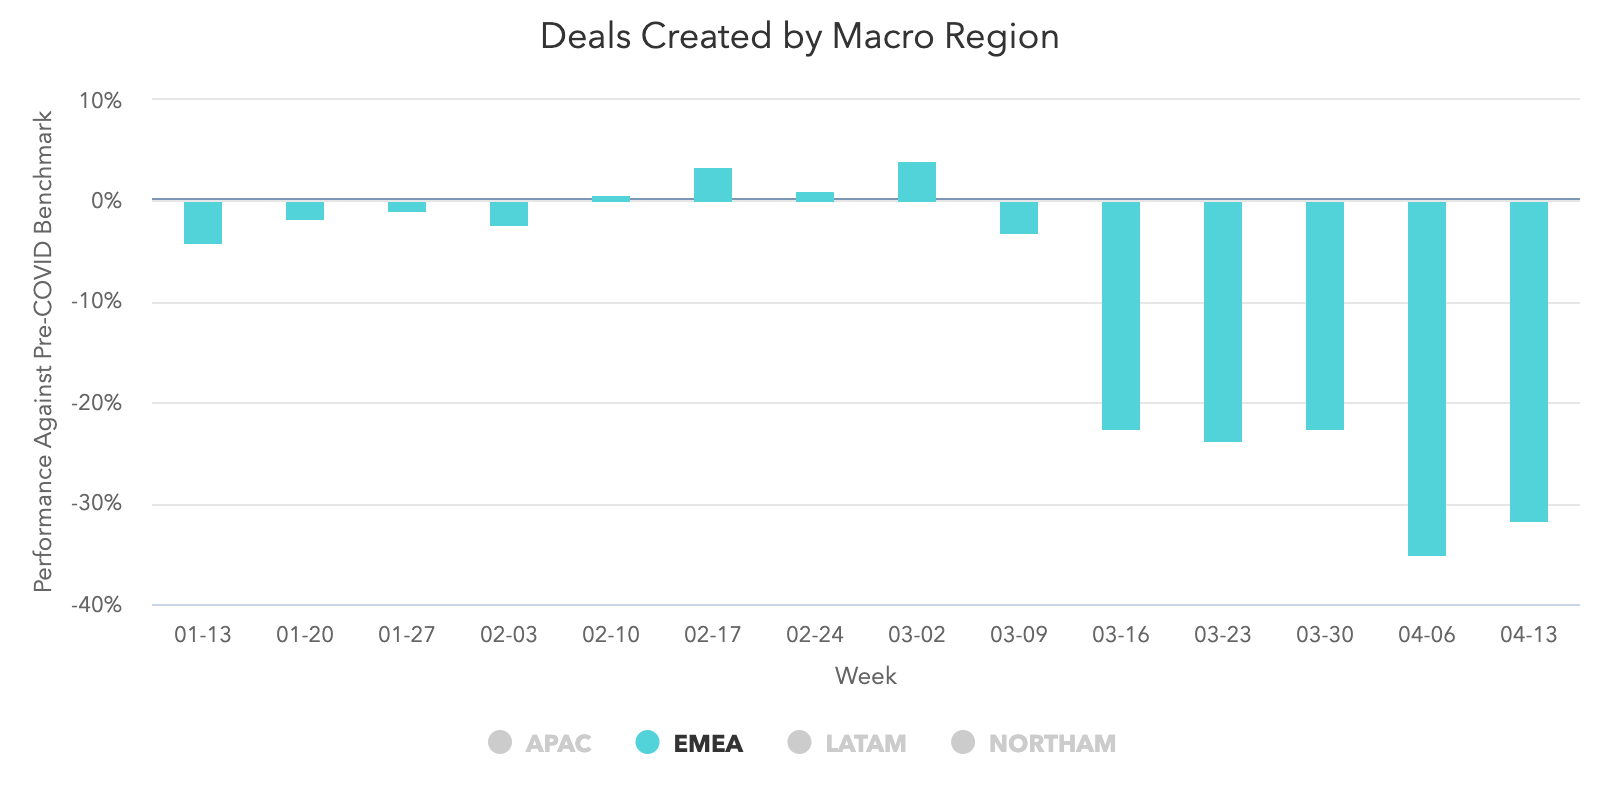 Deals-Created-EMEA